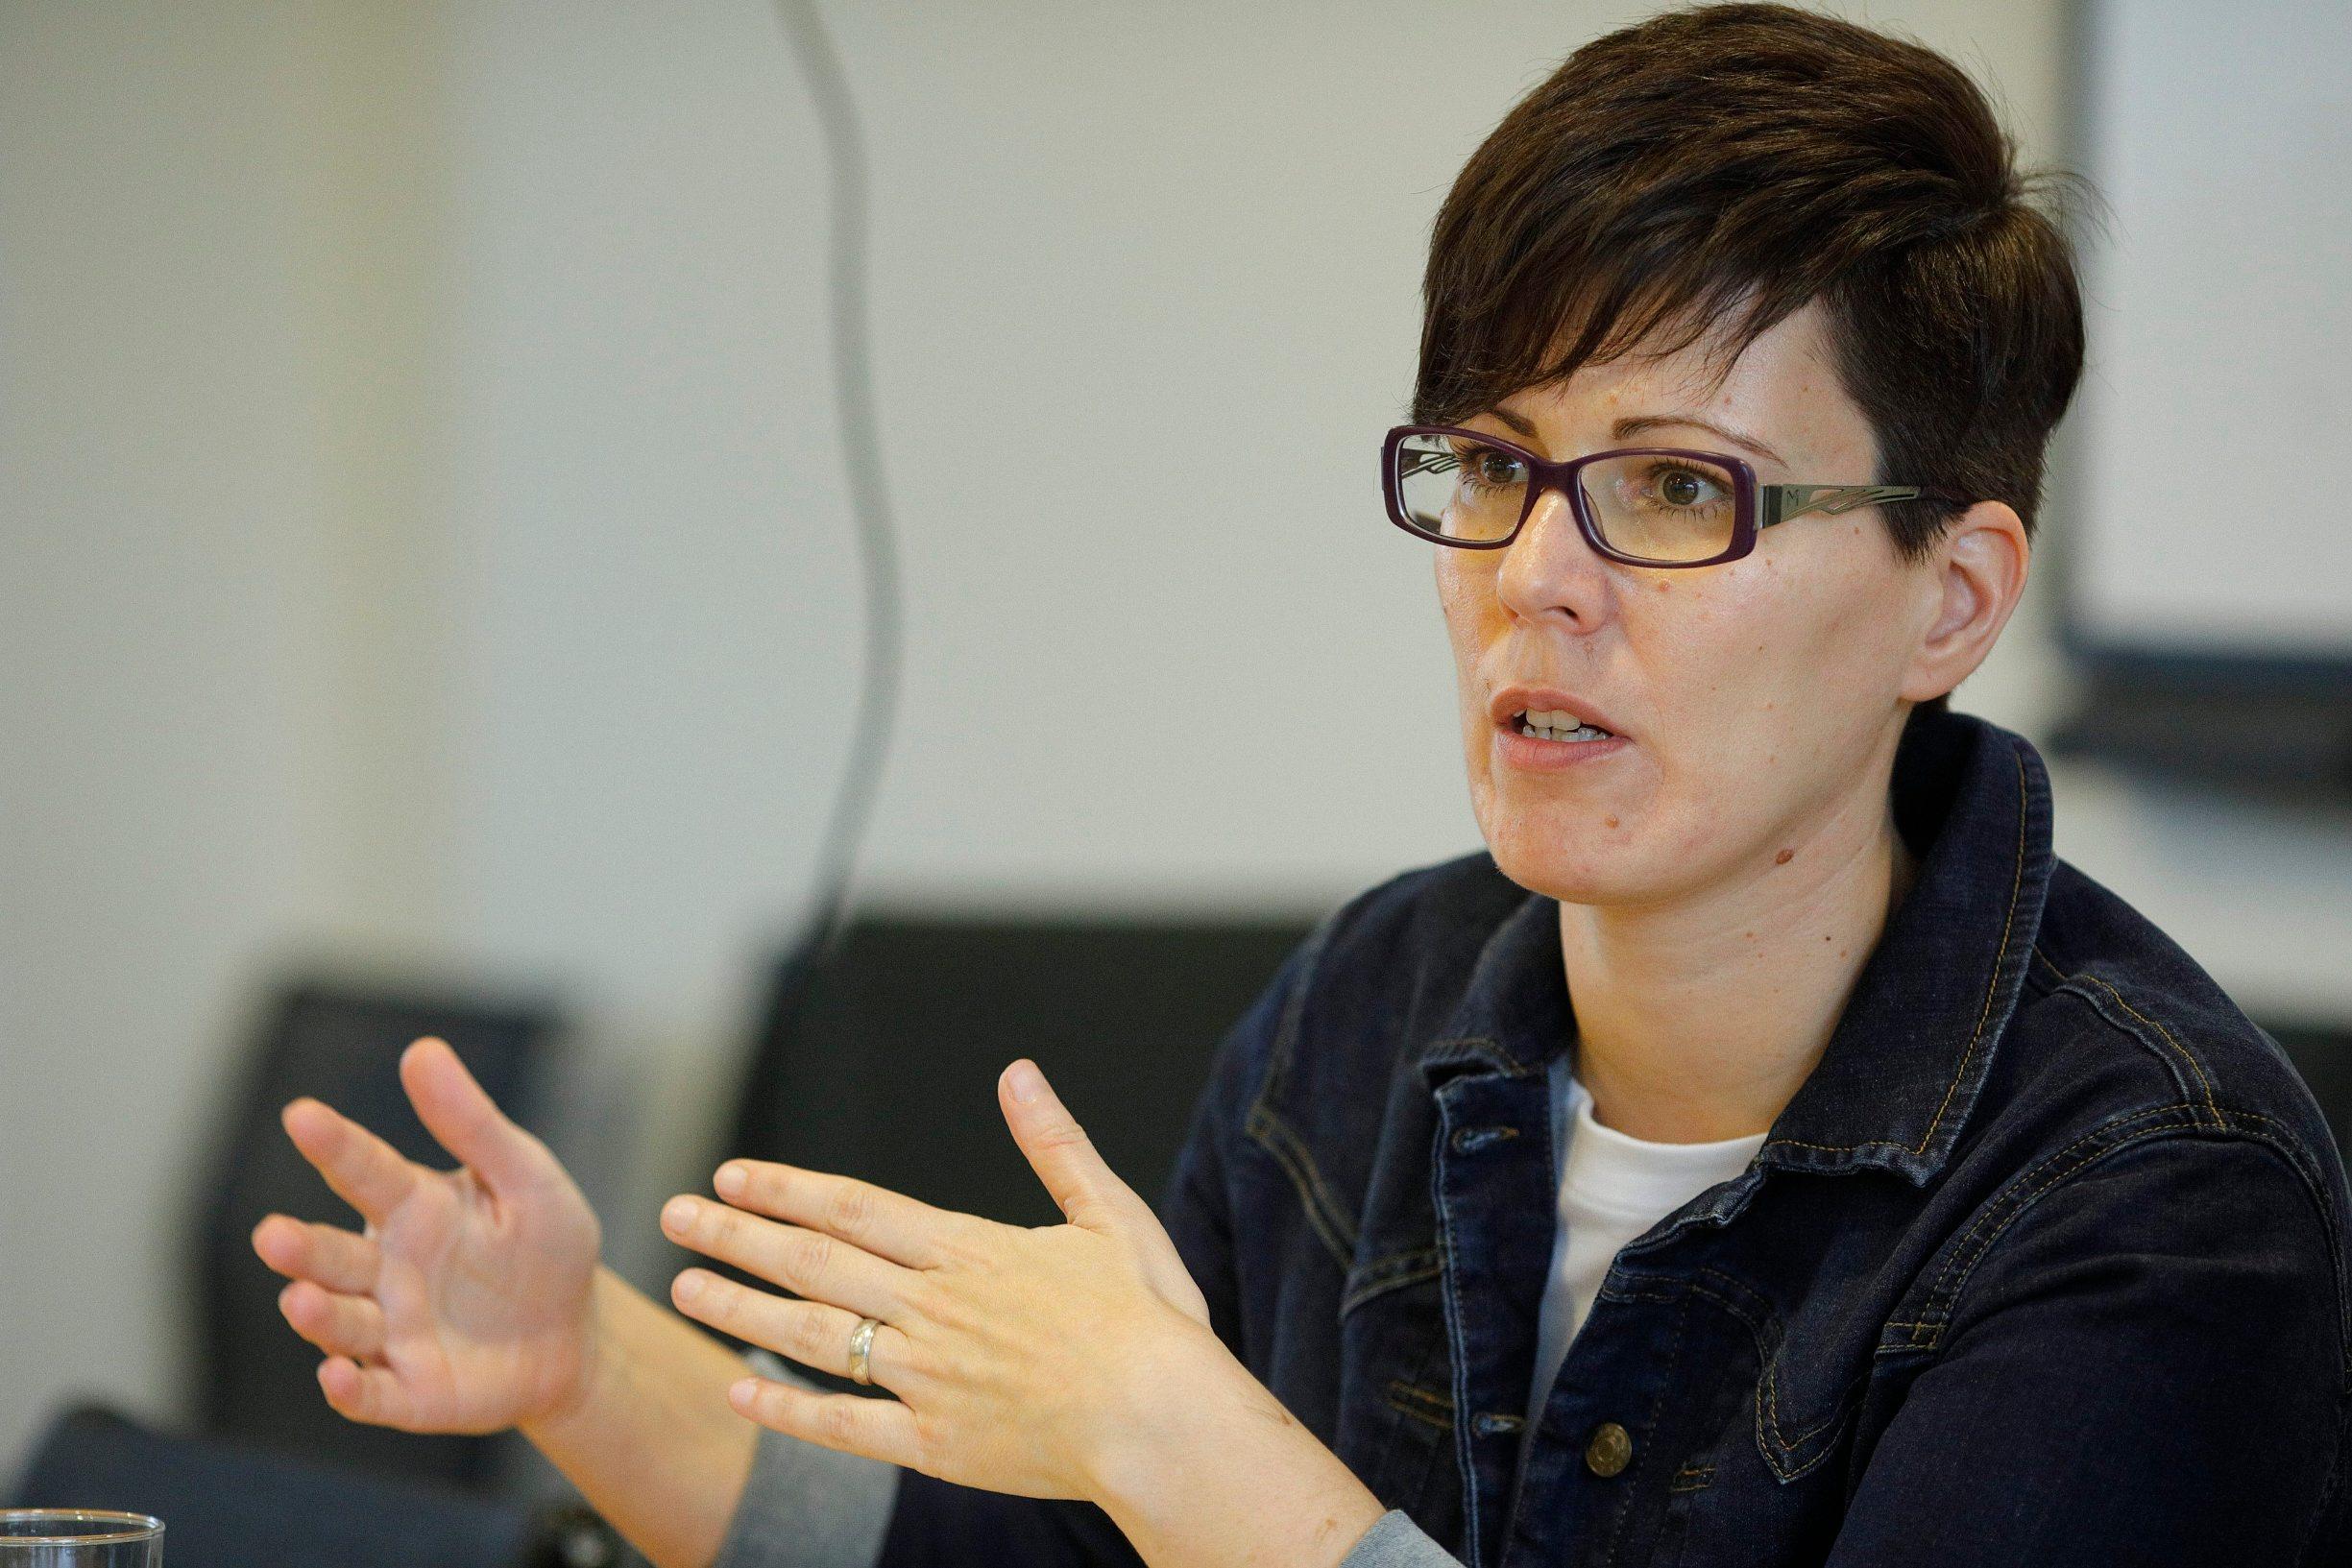 Zagreb, 240220. Okrugli stol Subvencionirani stambeni krediti, konferencijska dovrana Hanza Media. Na fotografiji: Maruska Vizek. Foto: Dragan Matic / CROPIX